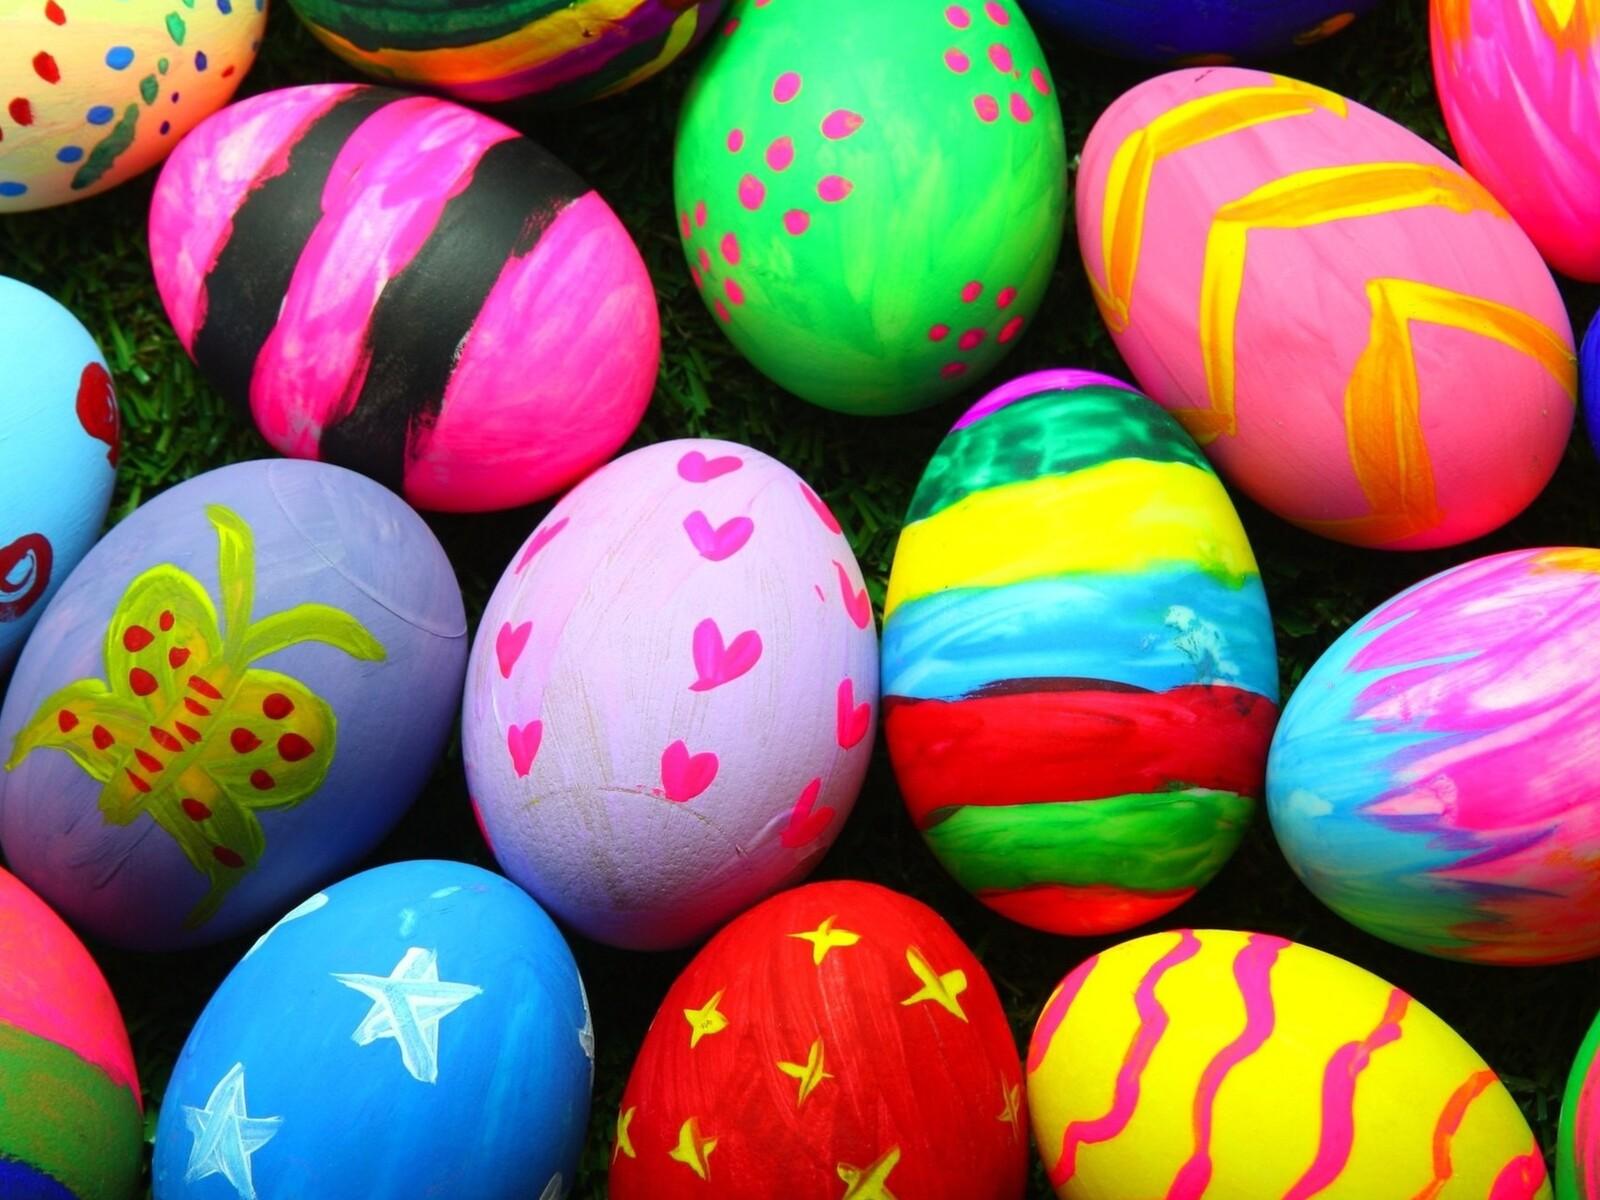 colorful-easter-eggs.jpg